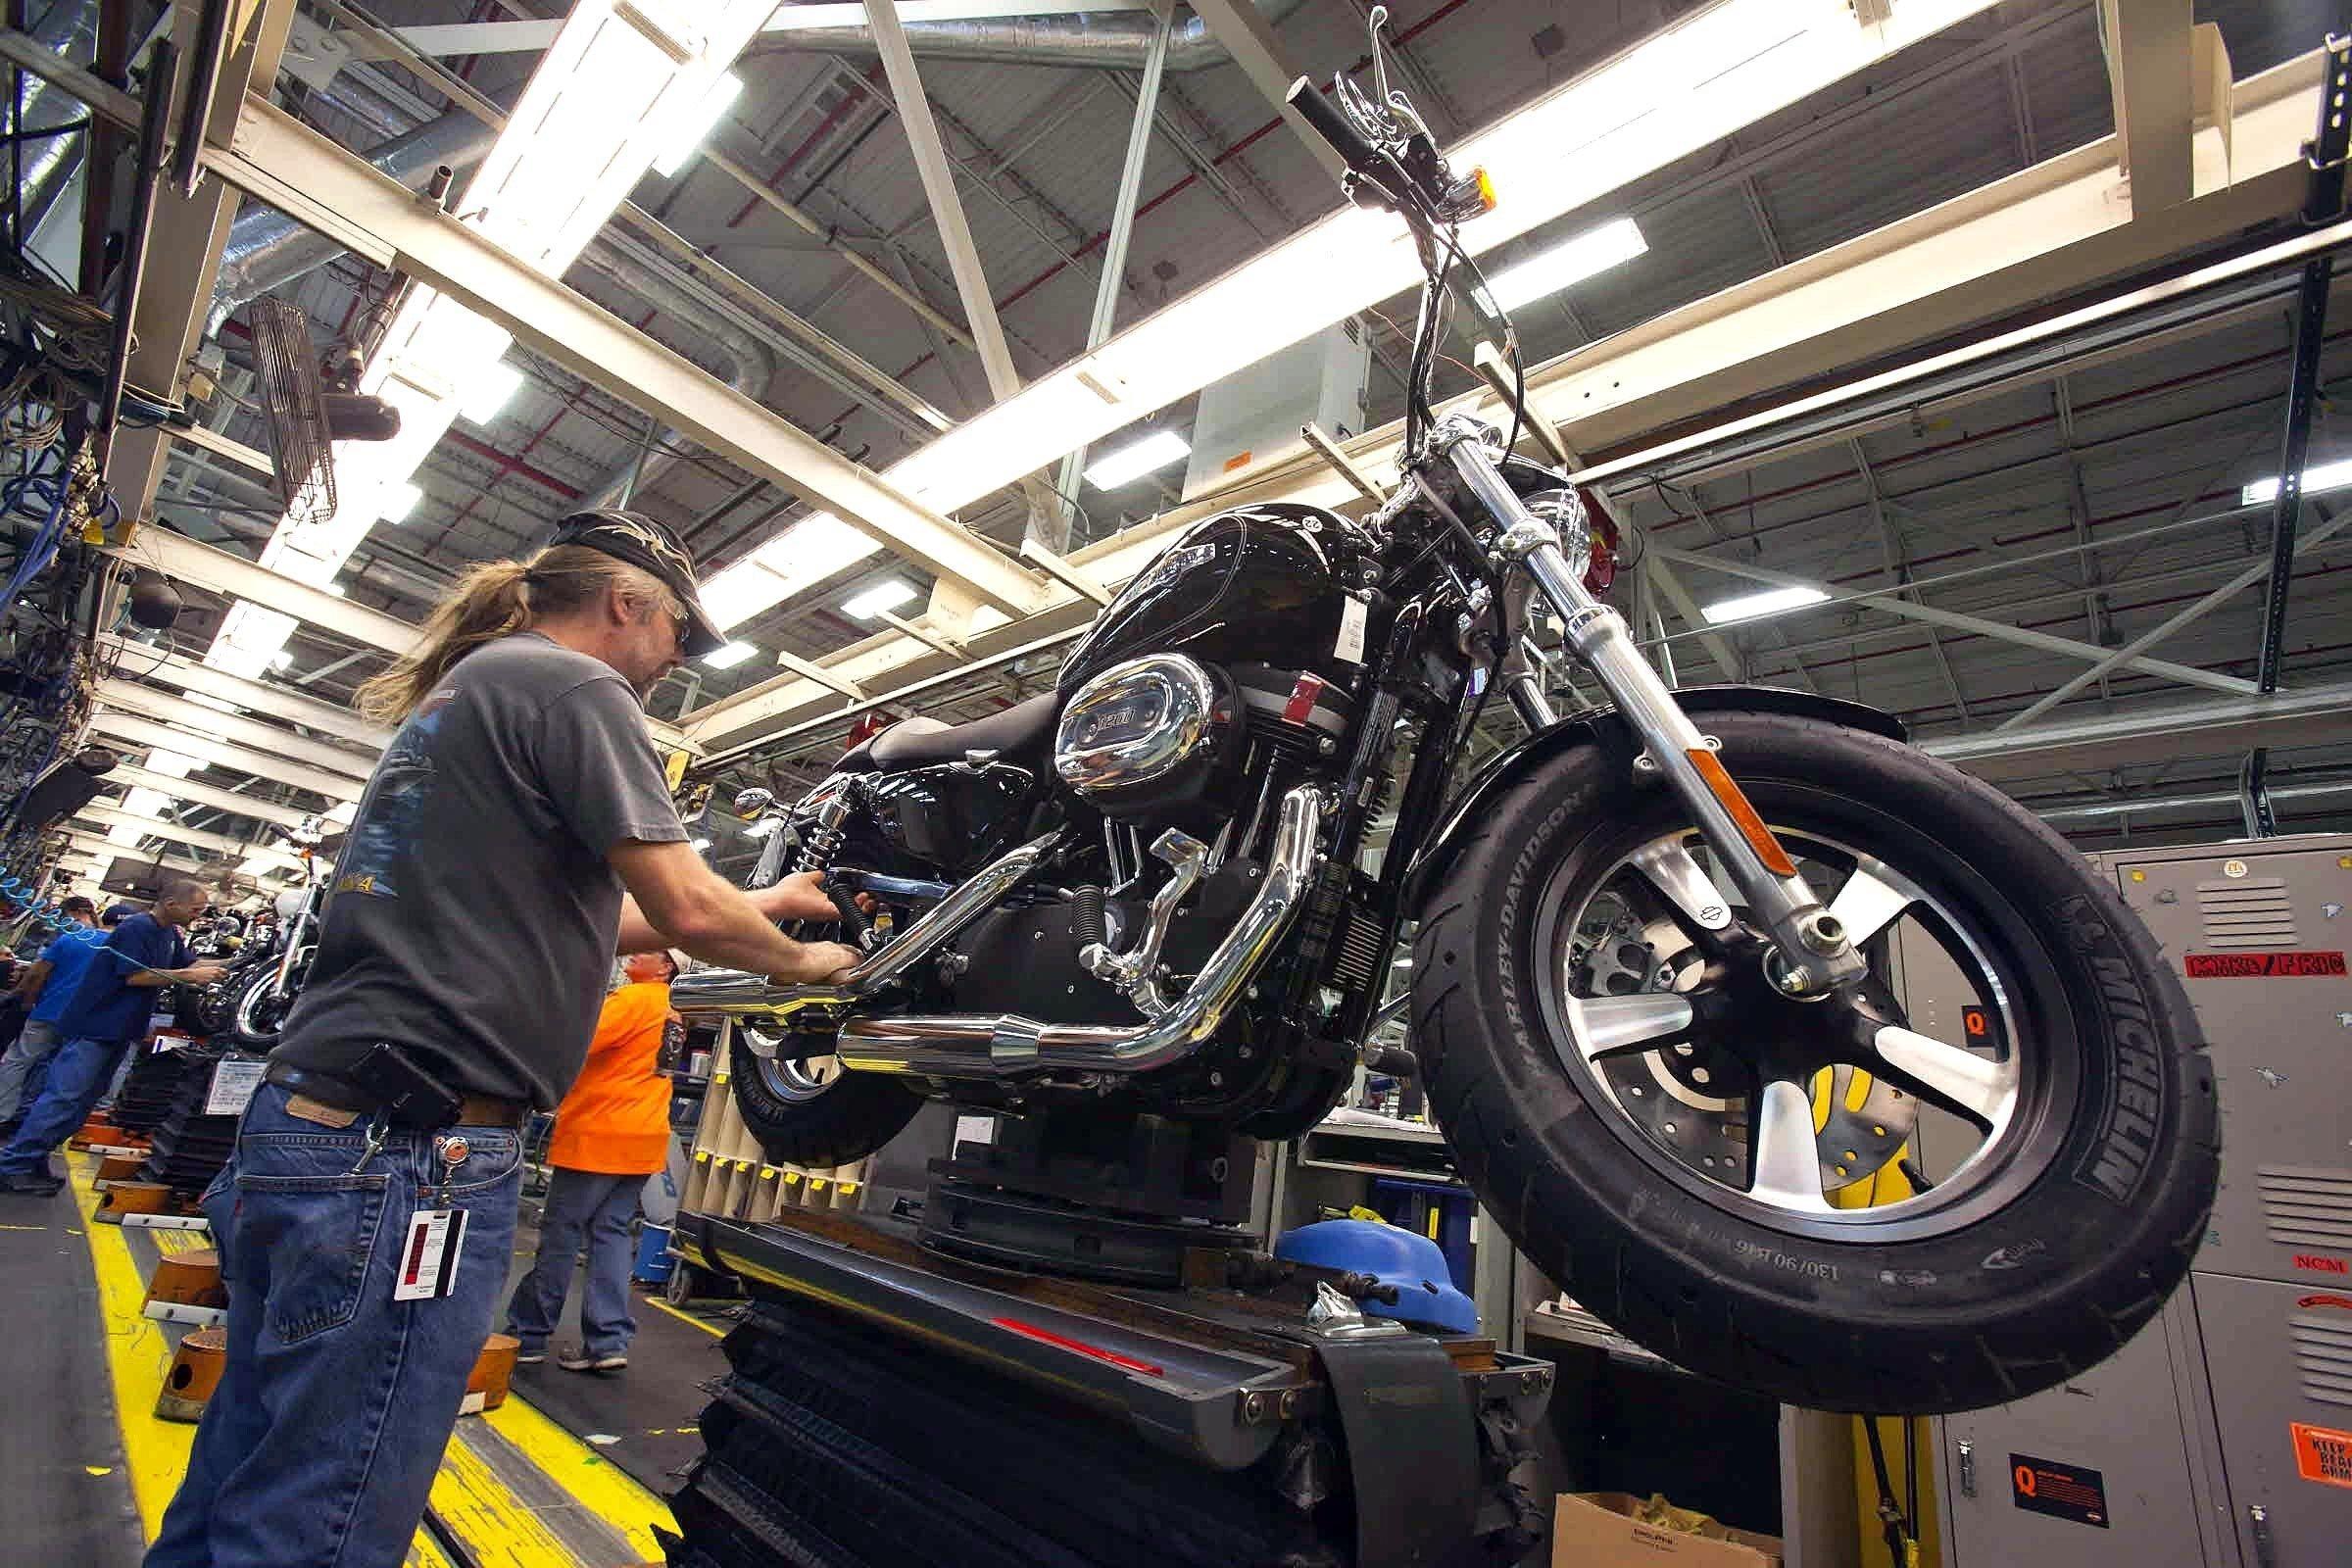 Harley-Davidson Slashes Shipment Guidance; Stock Plunges